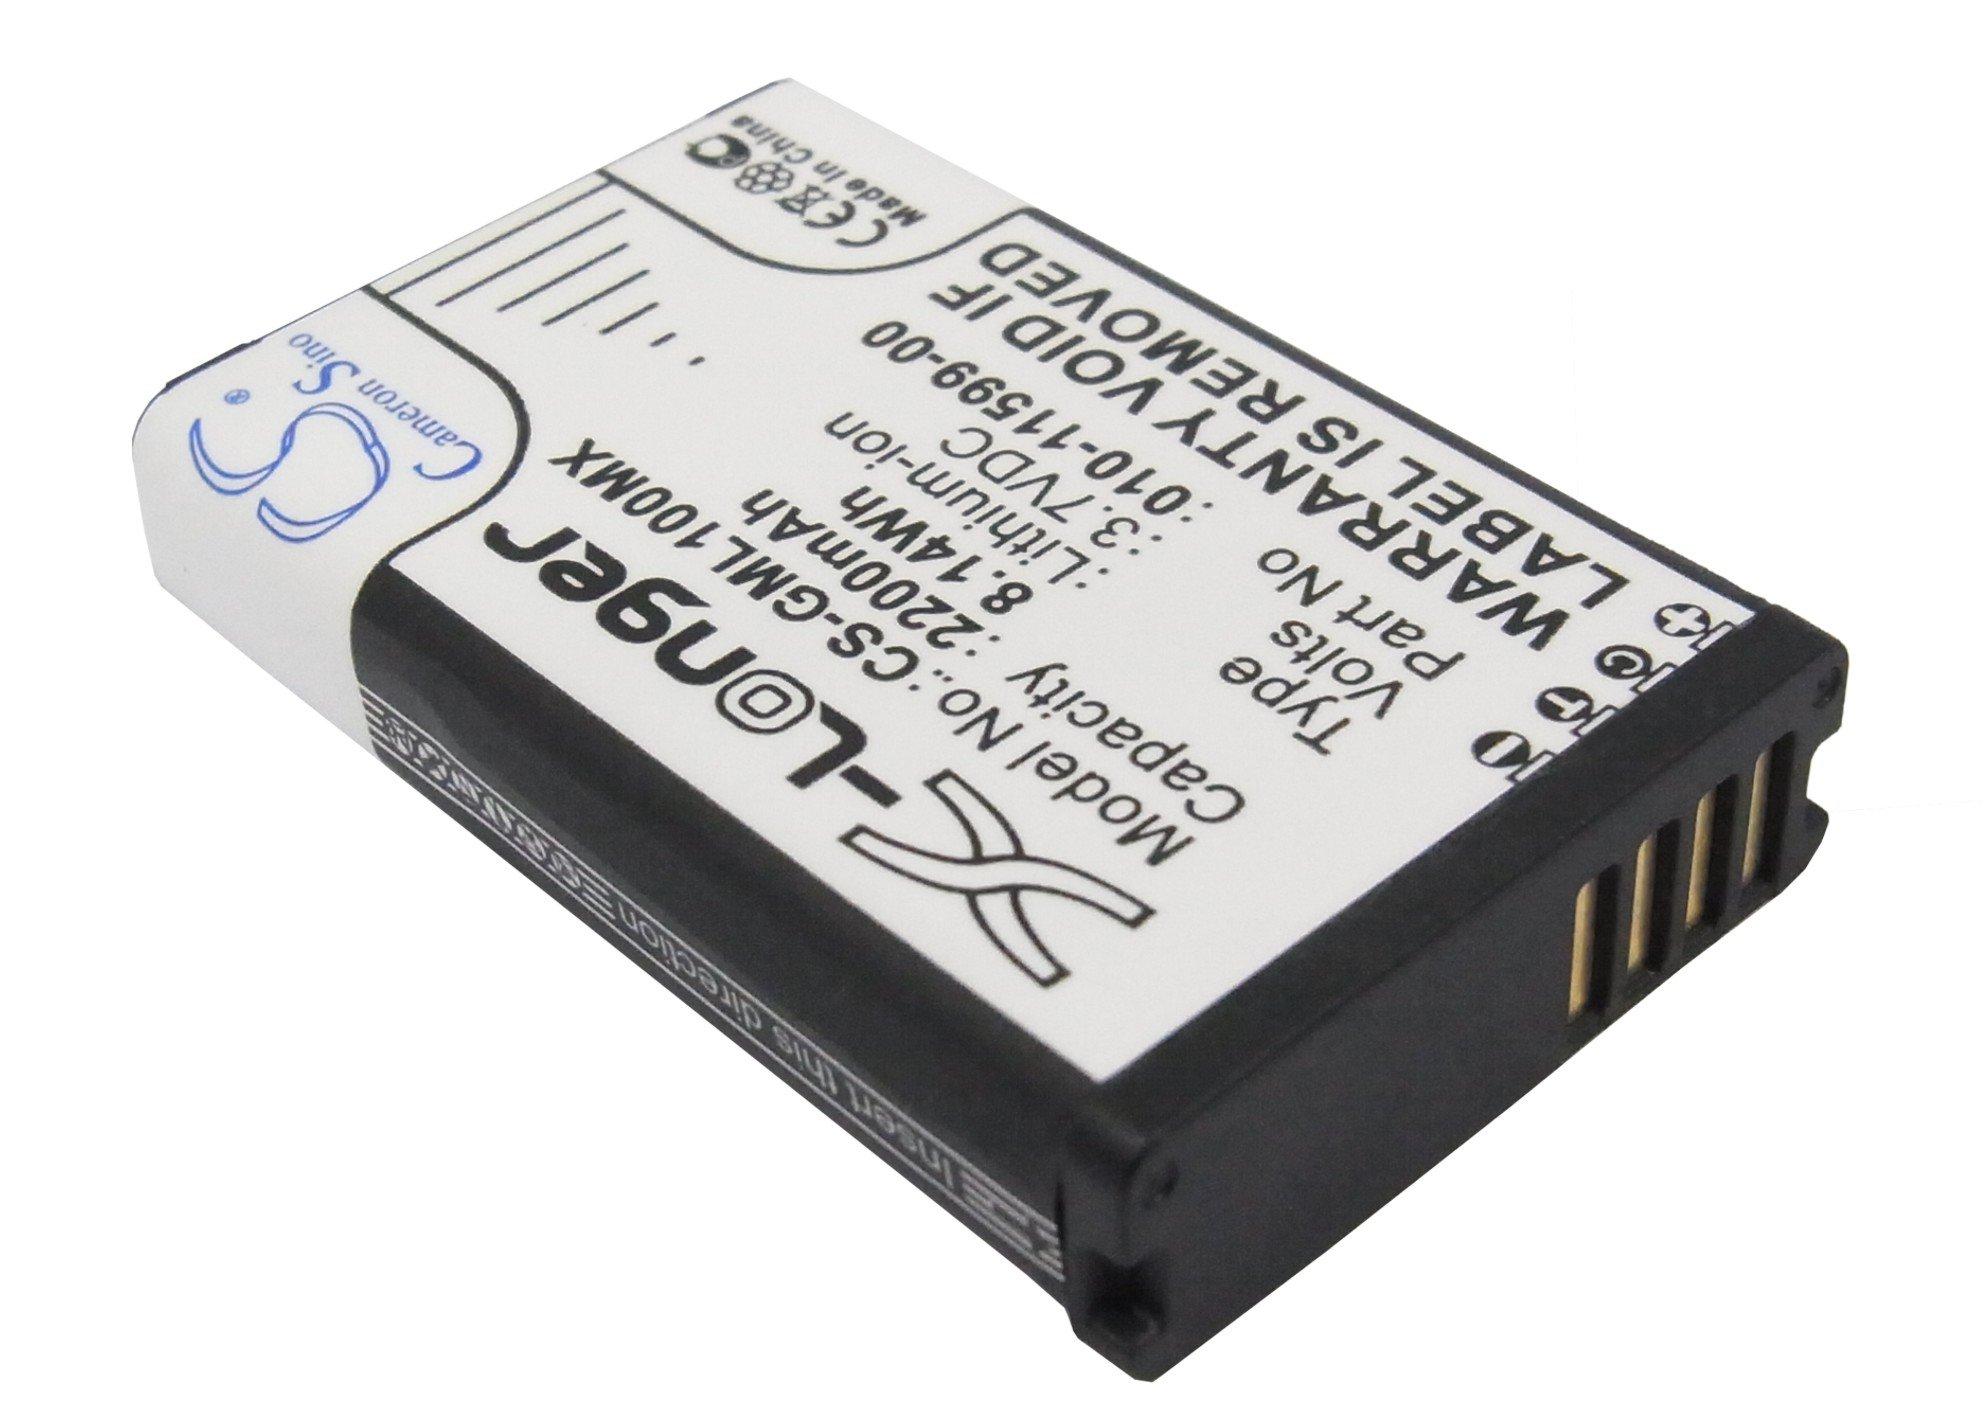 Cameron Sino Аккумулятор для GPS-навигатора Garmin 010-11599-00, 010-11654-03 3,7V 2200mAh код 008.01051